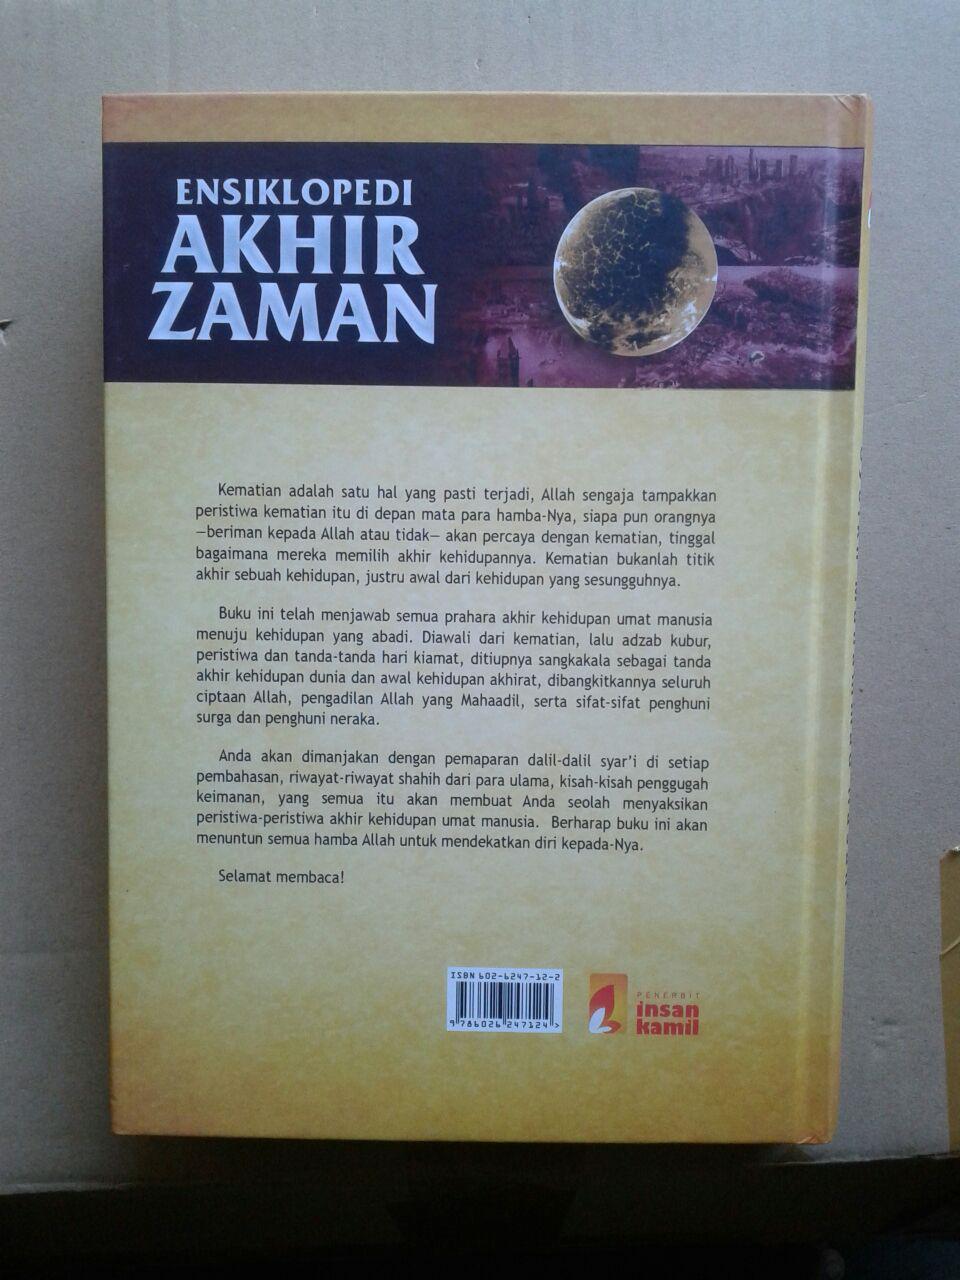 Buku Ensiklopedi Akhir Zaman Cover 2